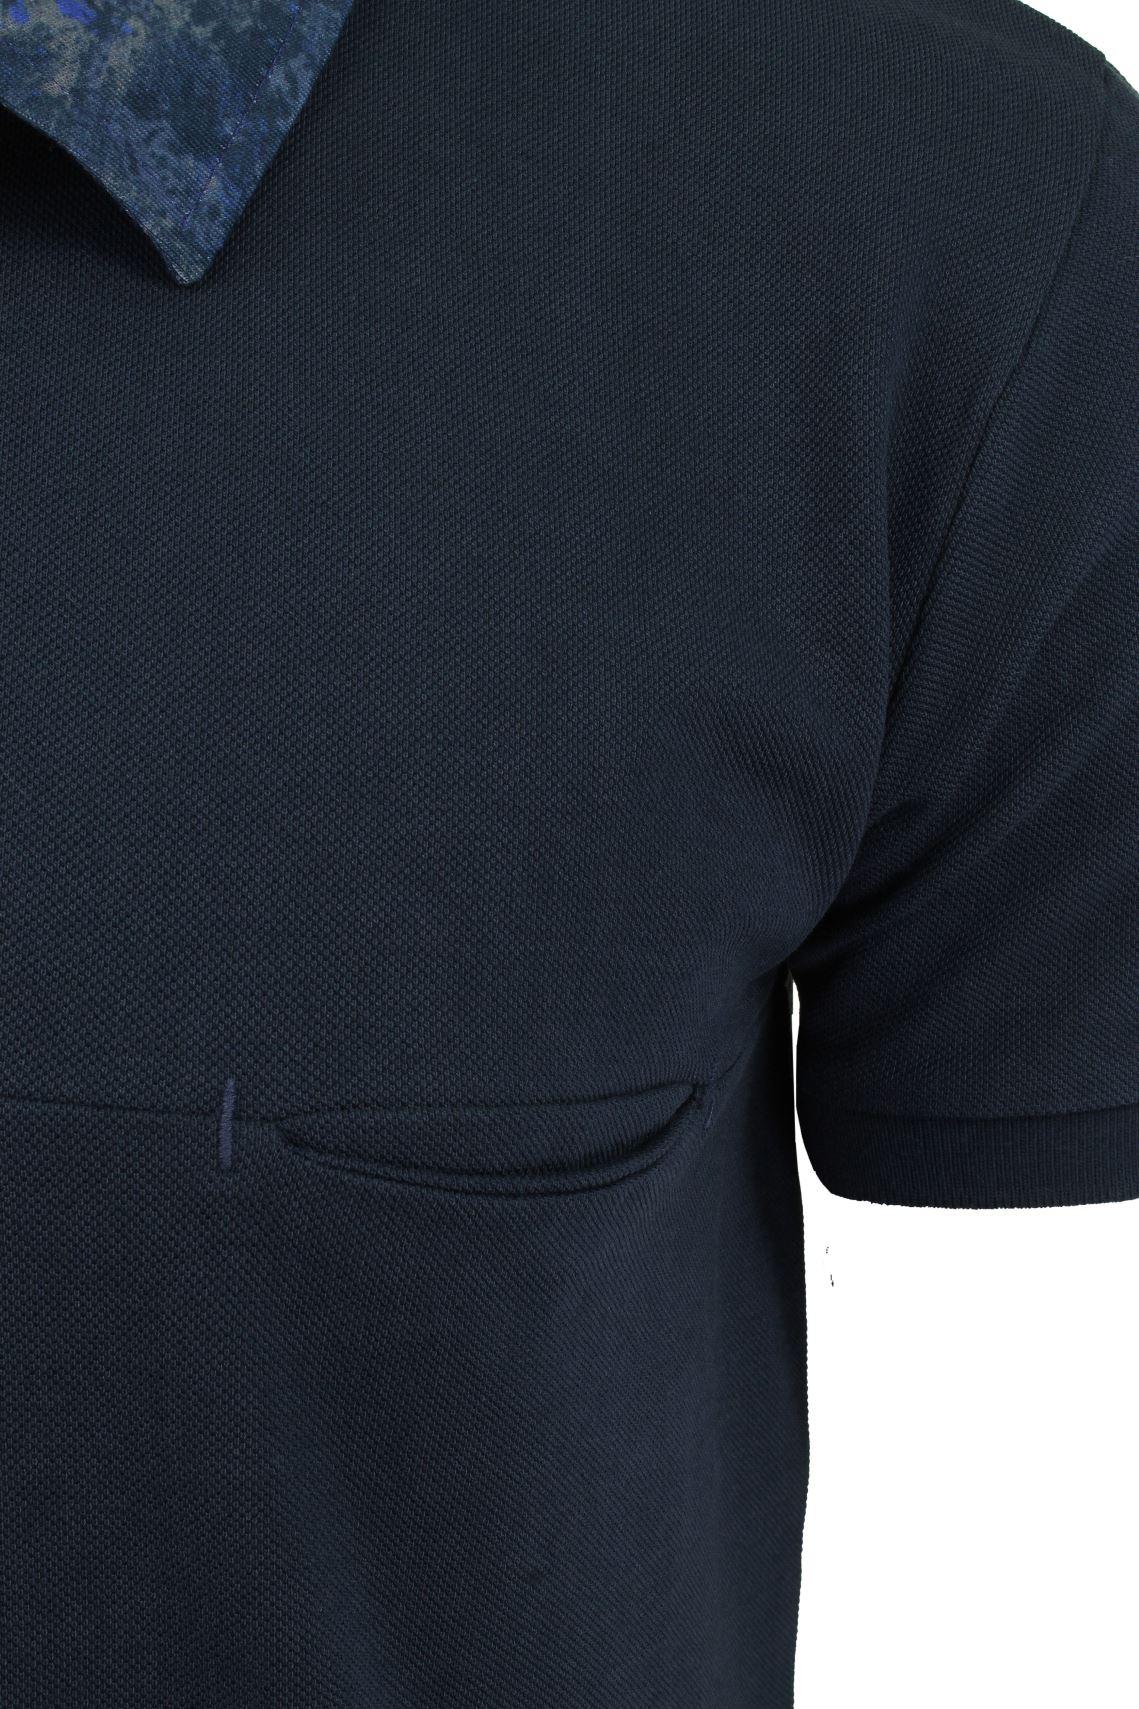 Camisa-Polo-para-hombre-Manga-corta-desde-el-apagon-Collection-by-Voi-Jeans miniatura 12